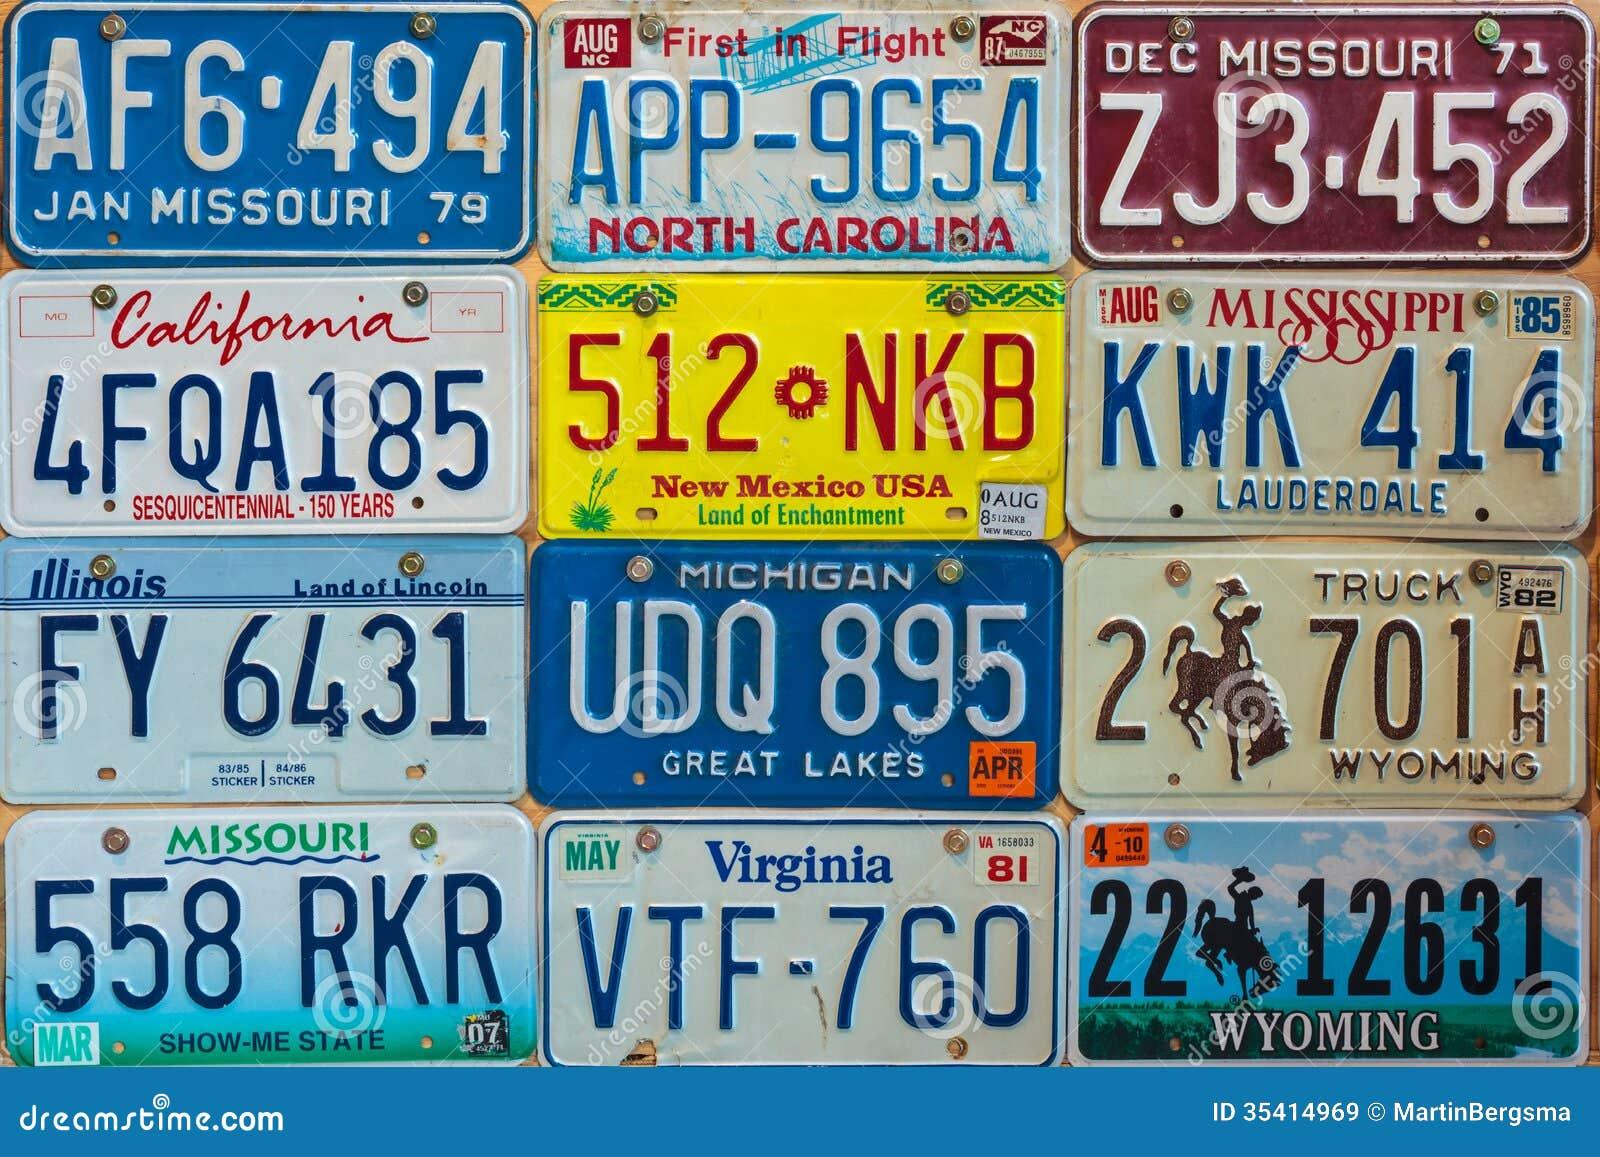 Car Vintage Plates How Old